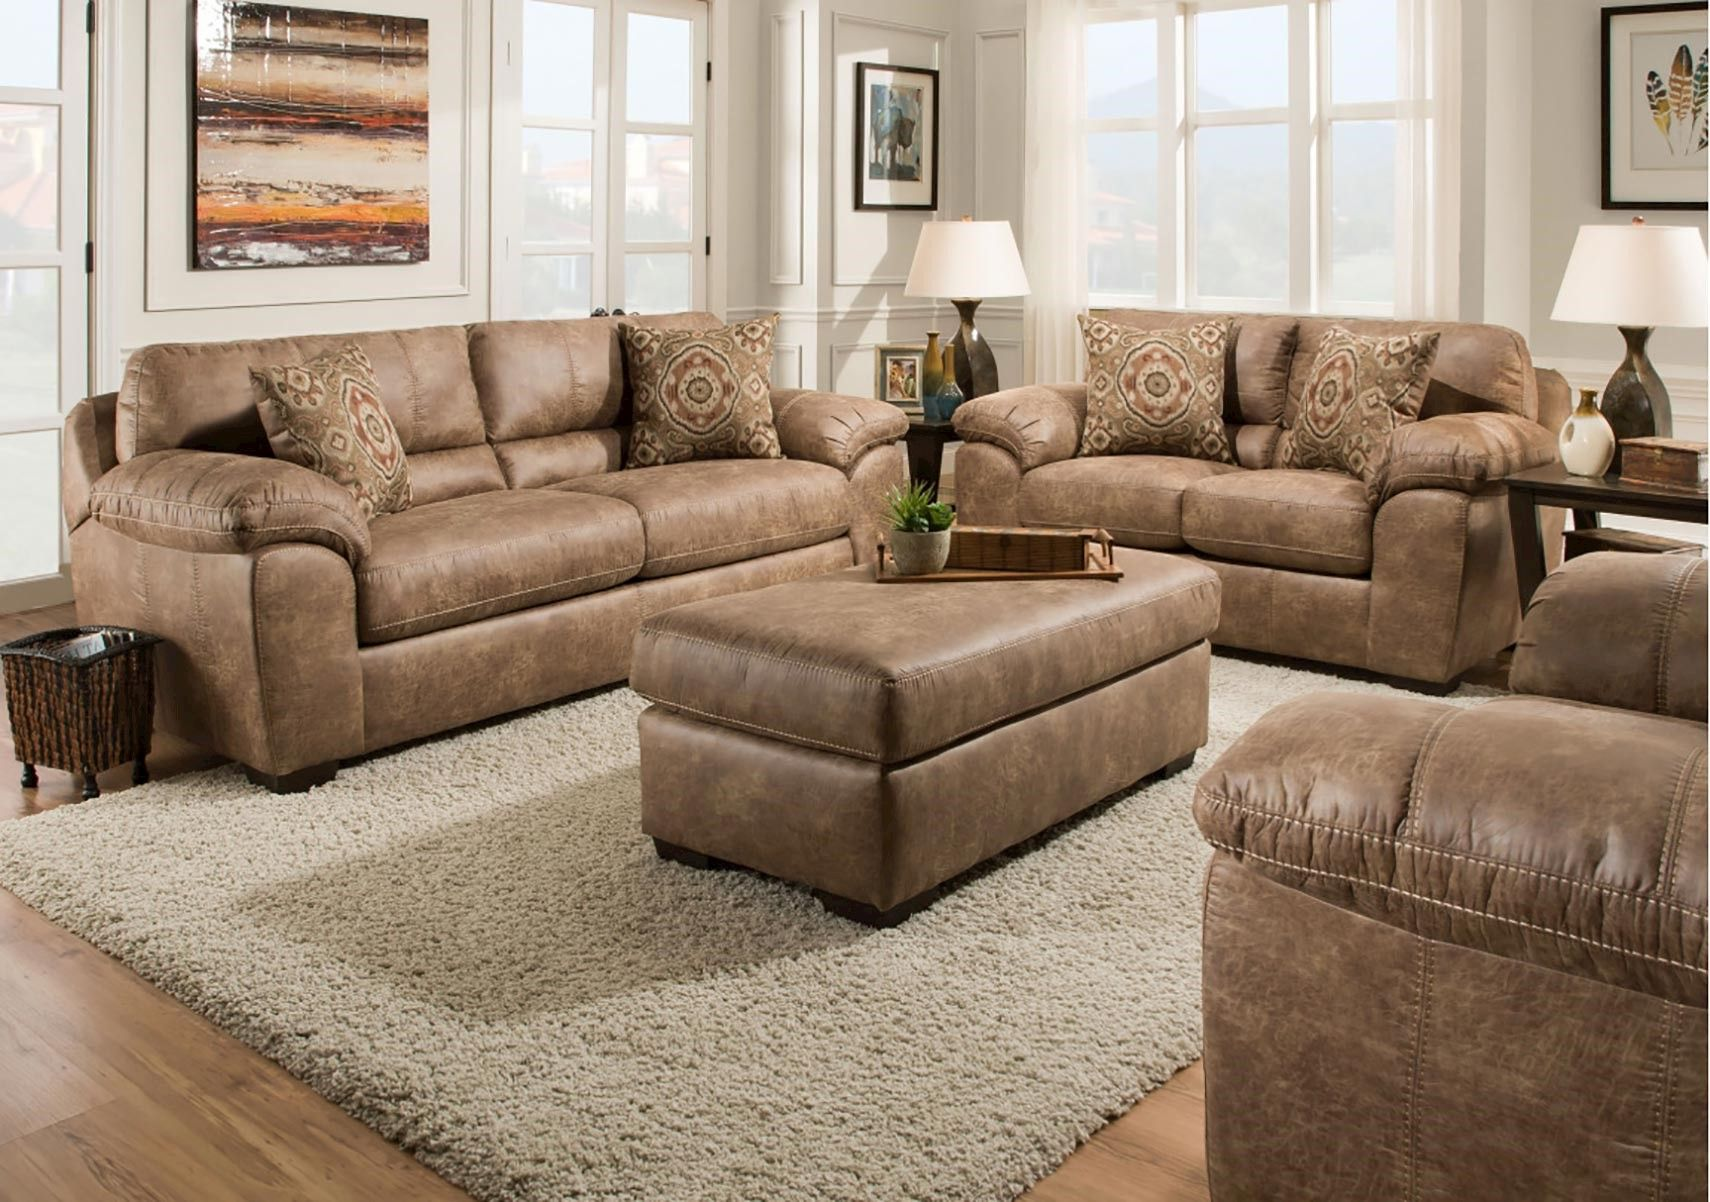 Lacks Santa Fe 2 Pc Living Room Set